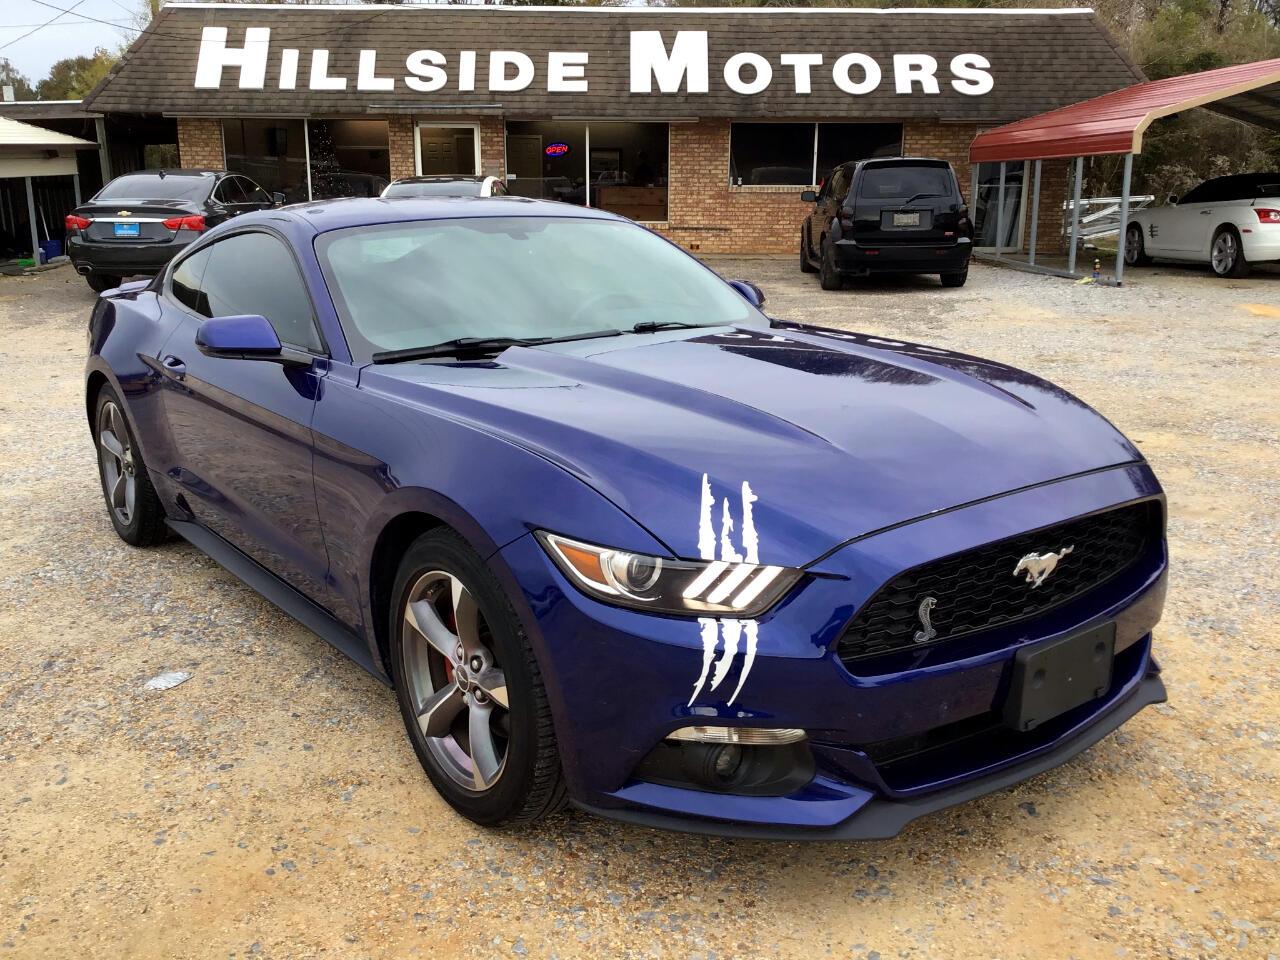 Used 2015 Ford Mustang V6 Coupe For Sale In Laurel Ms 39440 Hillside Motors